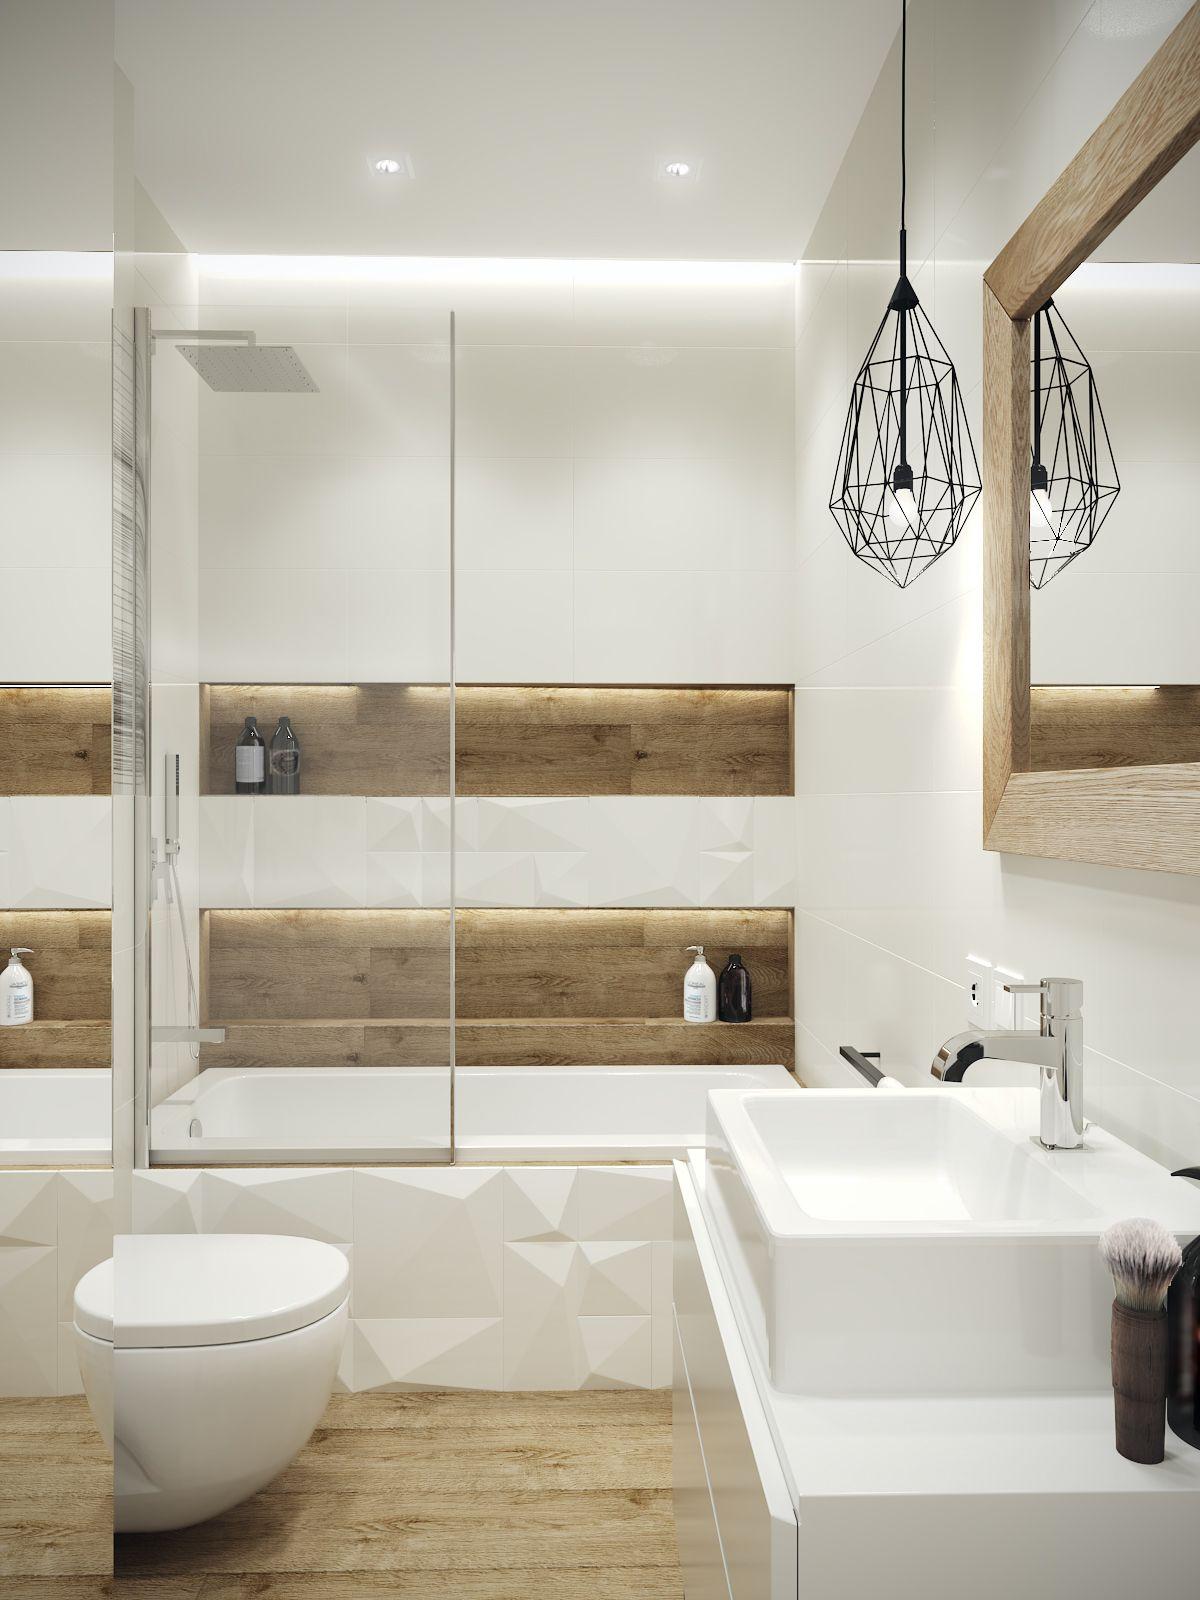 Salle De Bain sous Pente 5m2 Nouveau Photos Cosy Elegant and Functional Bathroom which is Only 4 5m2